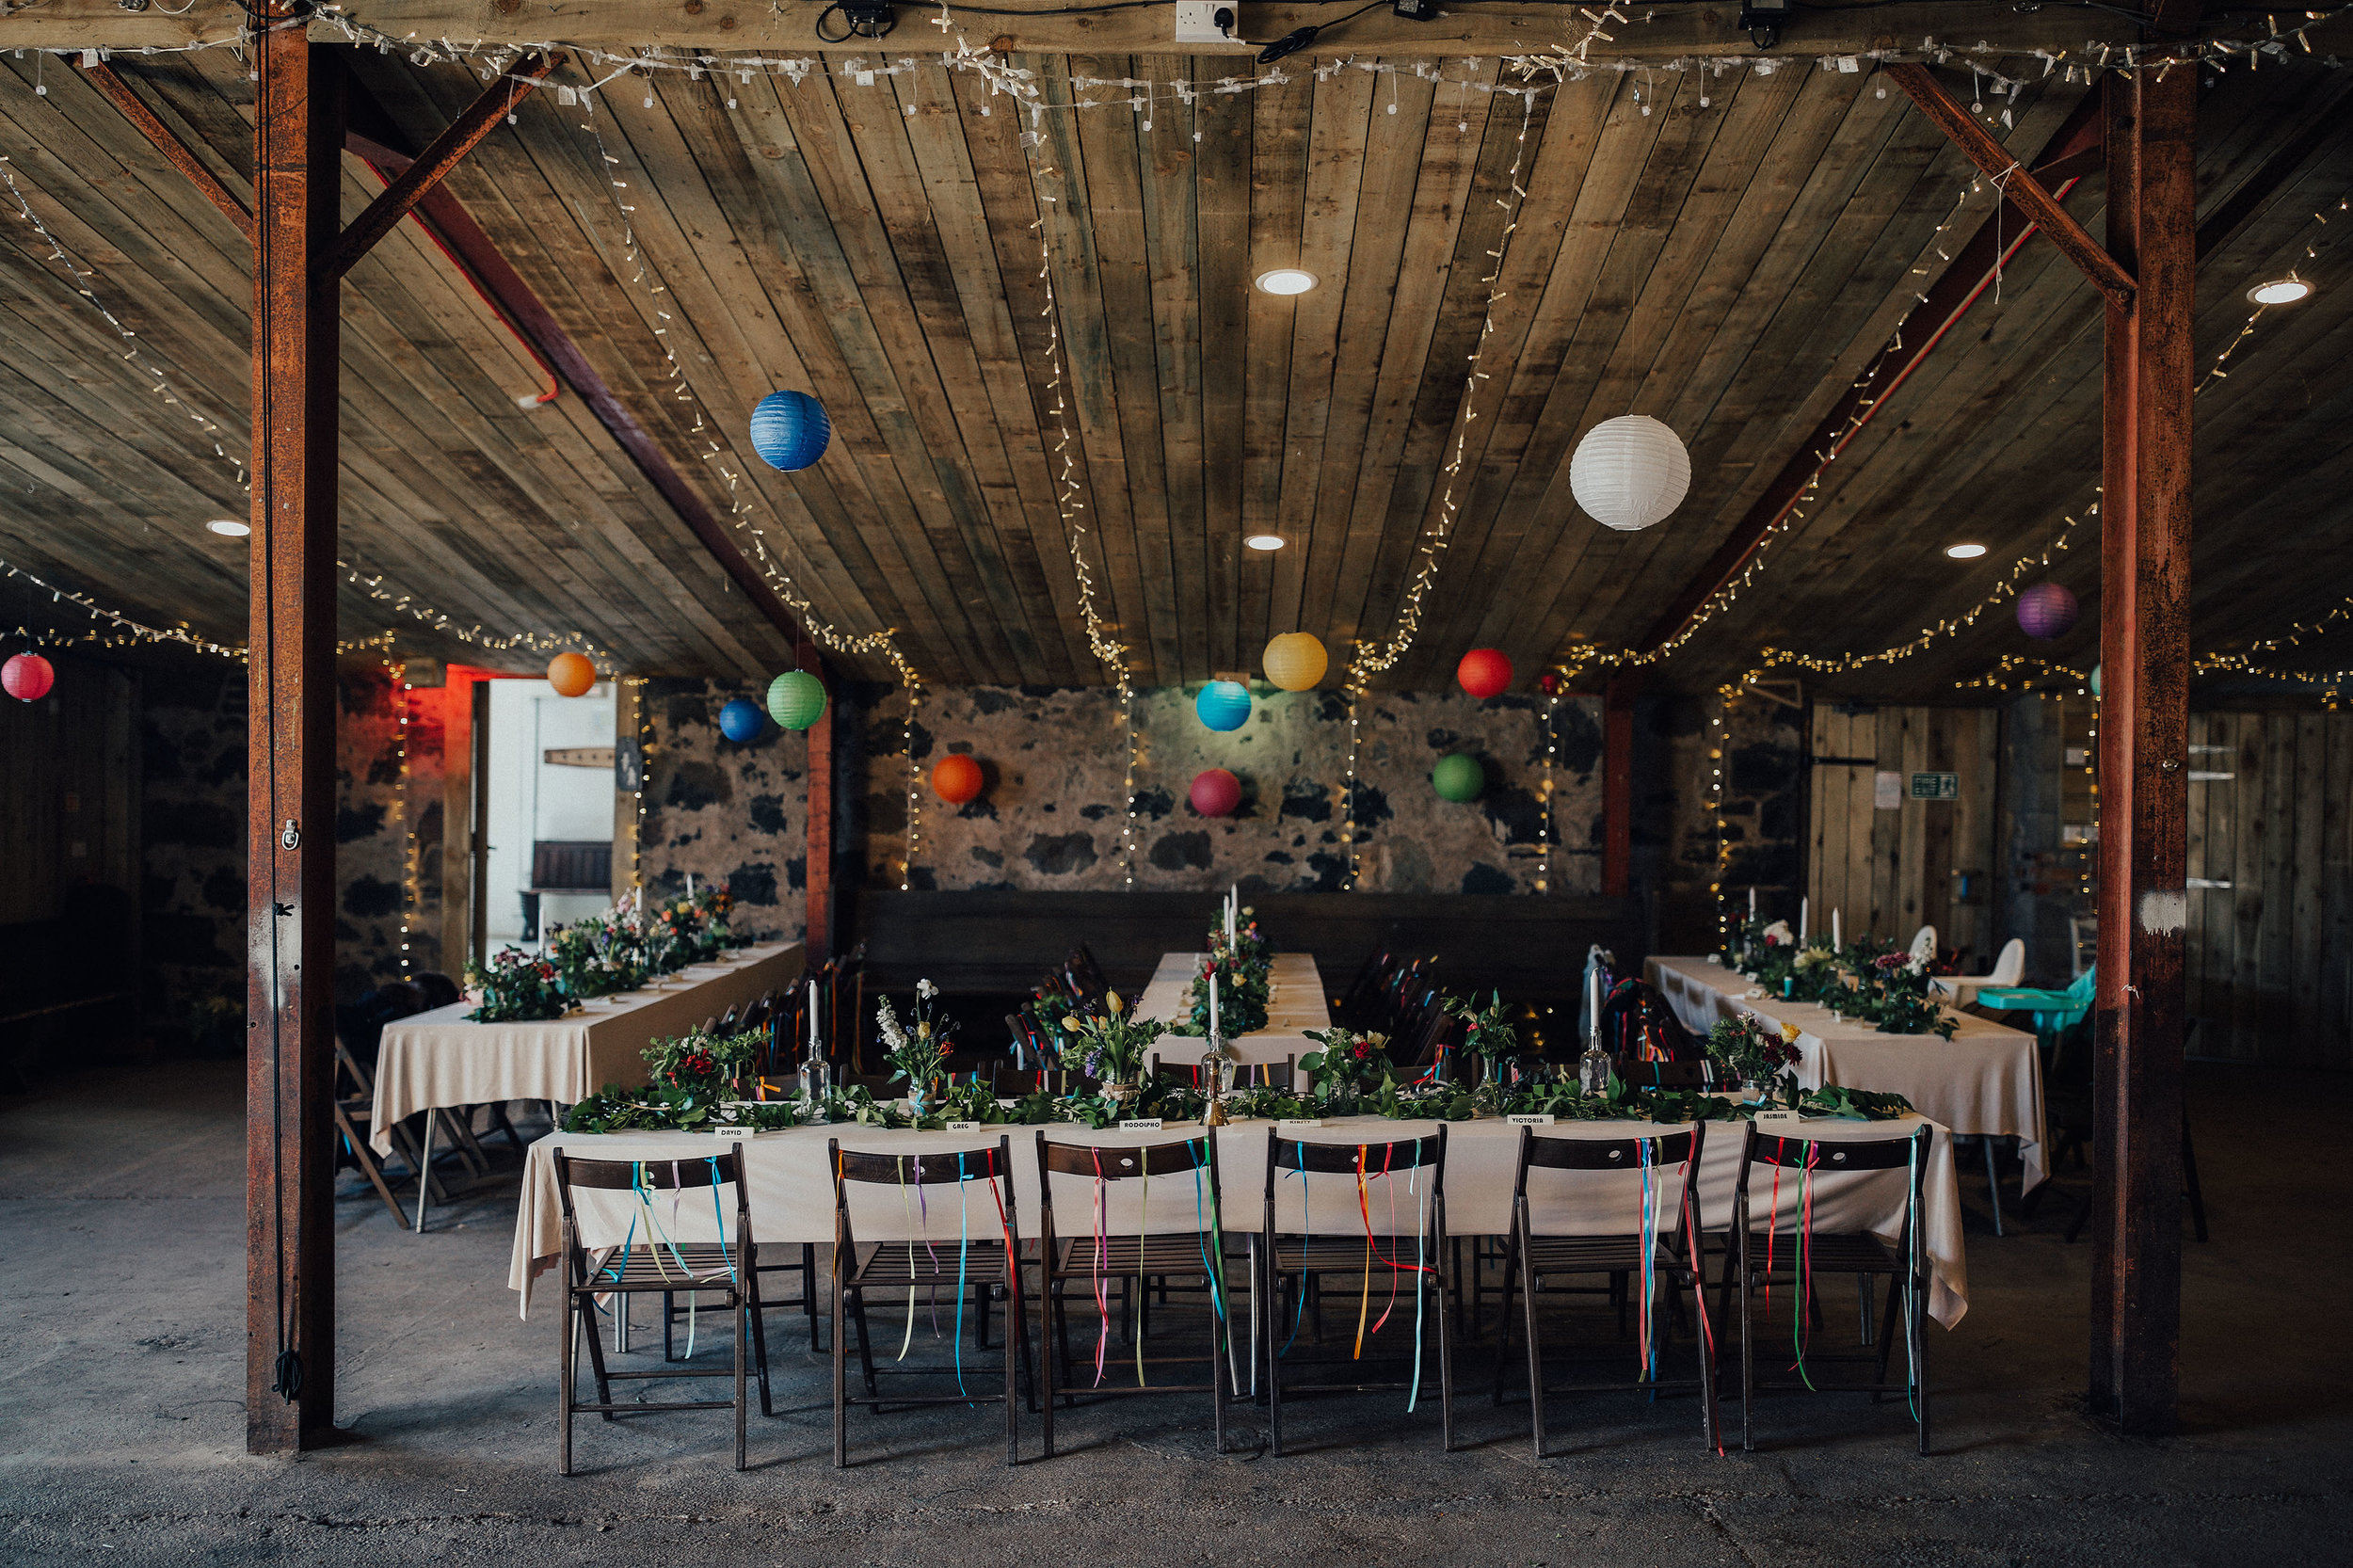 COMRIE_CROFT_WEDDINGS_PJ_PHILLIPS_PHOTOGRAPHY_110.jpg